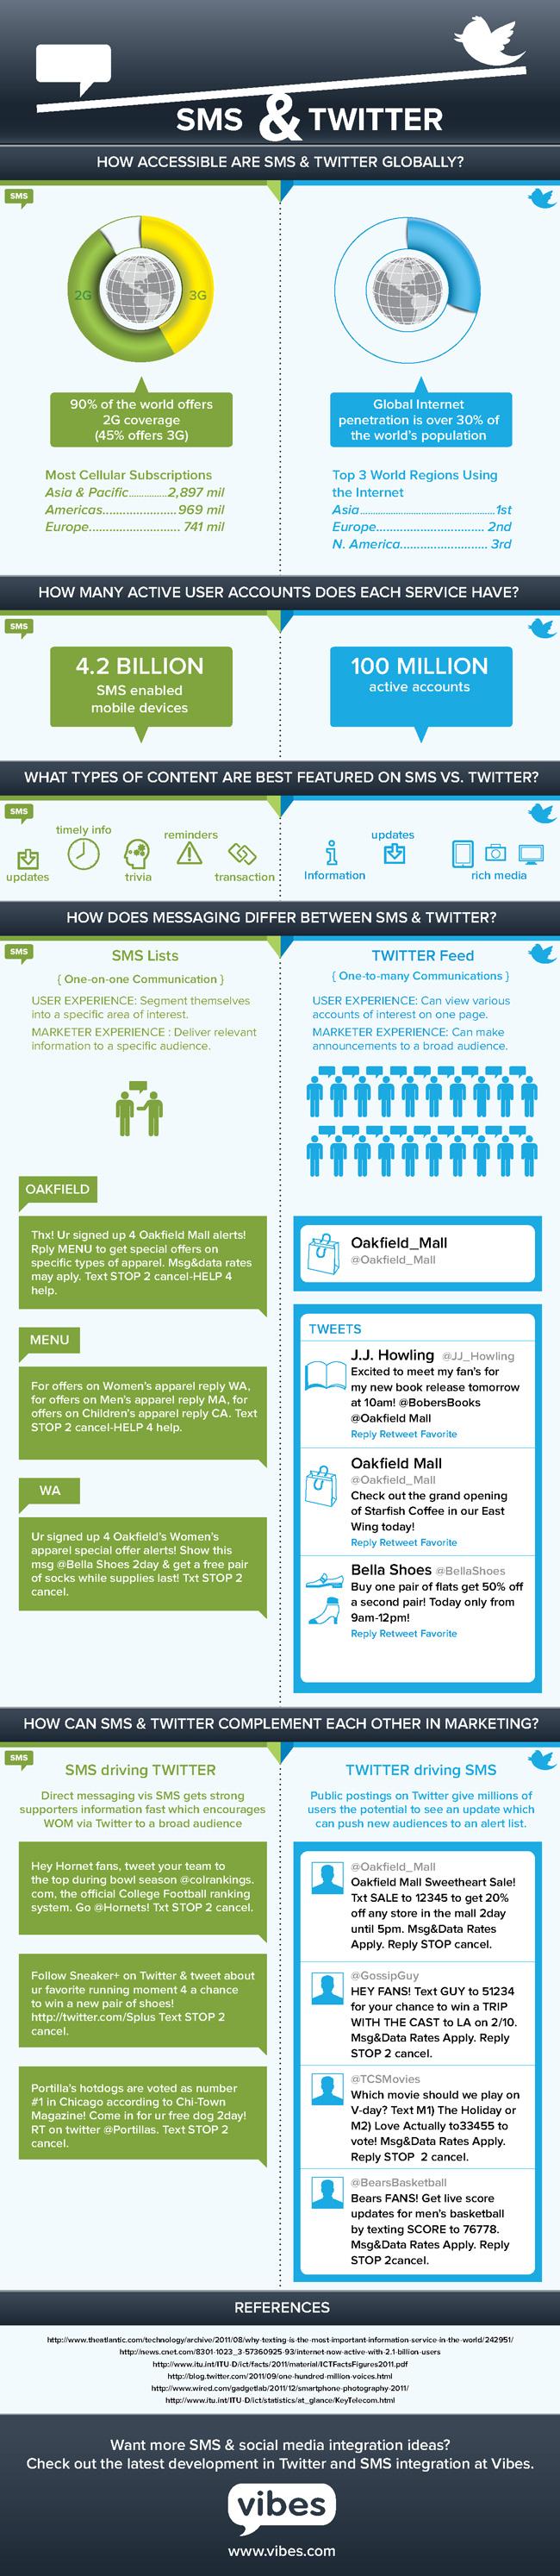 SMS vs Twitter Marketing